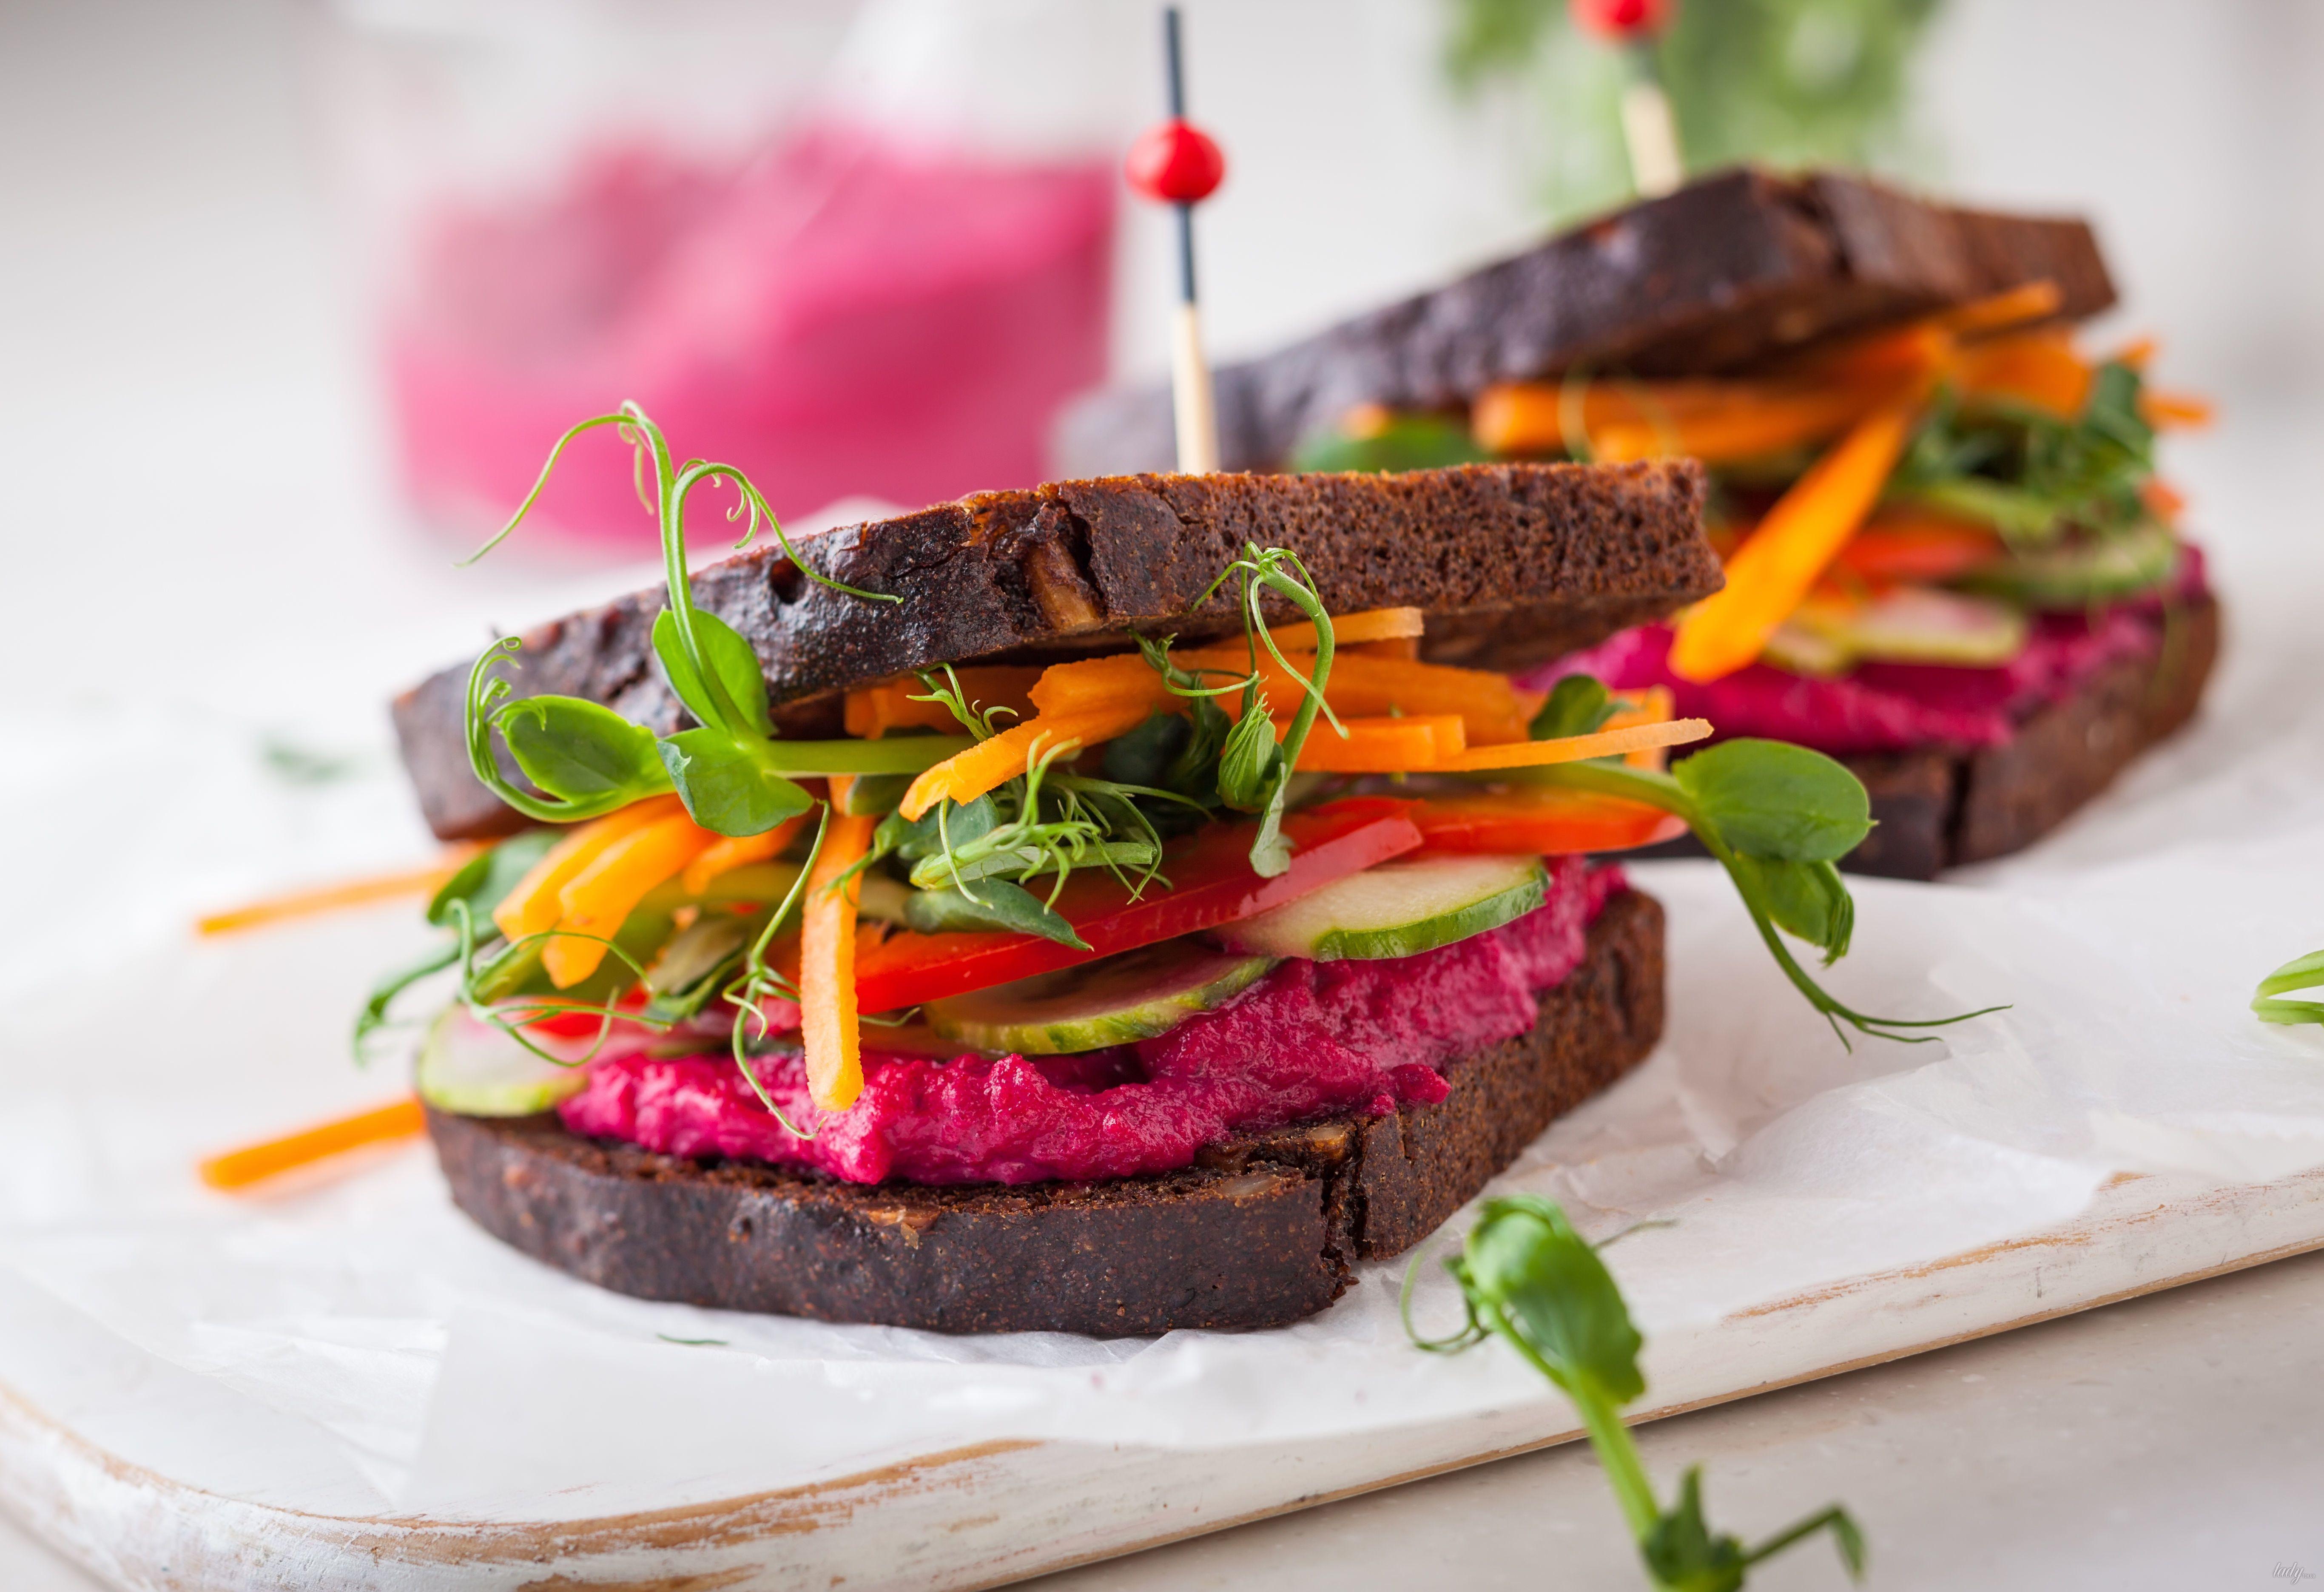 вегетаринство, закуска, овощи